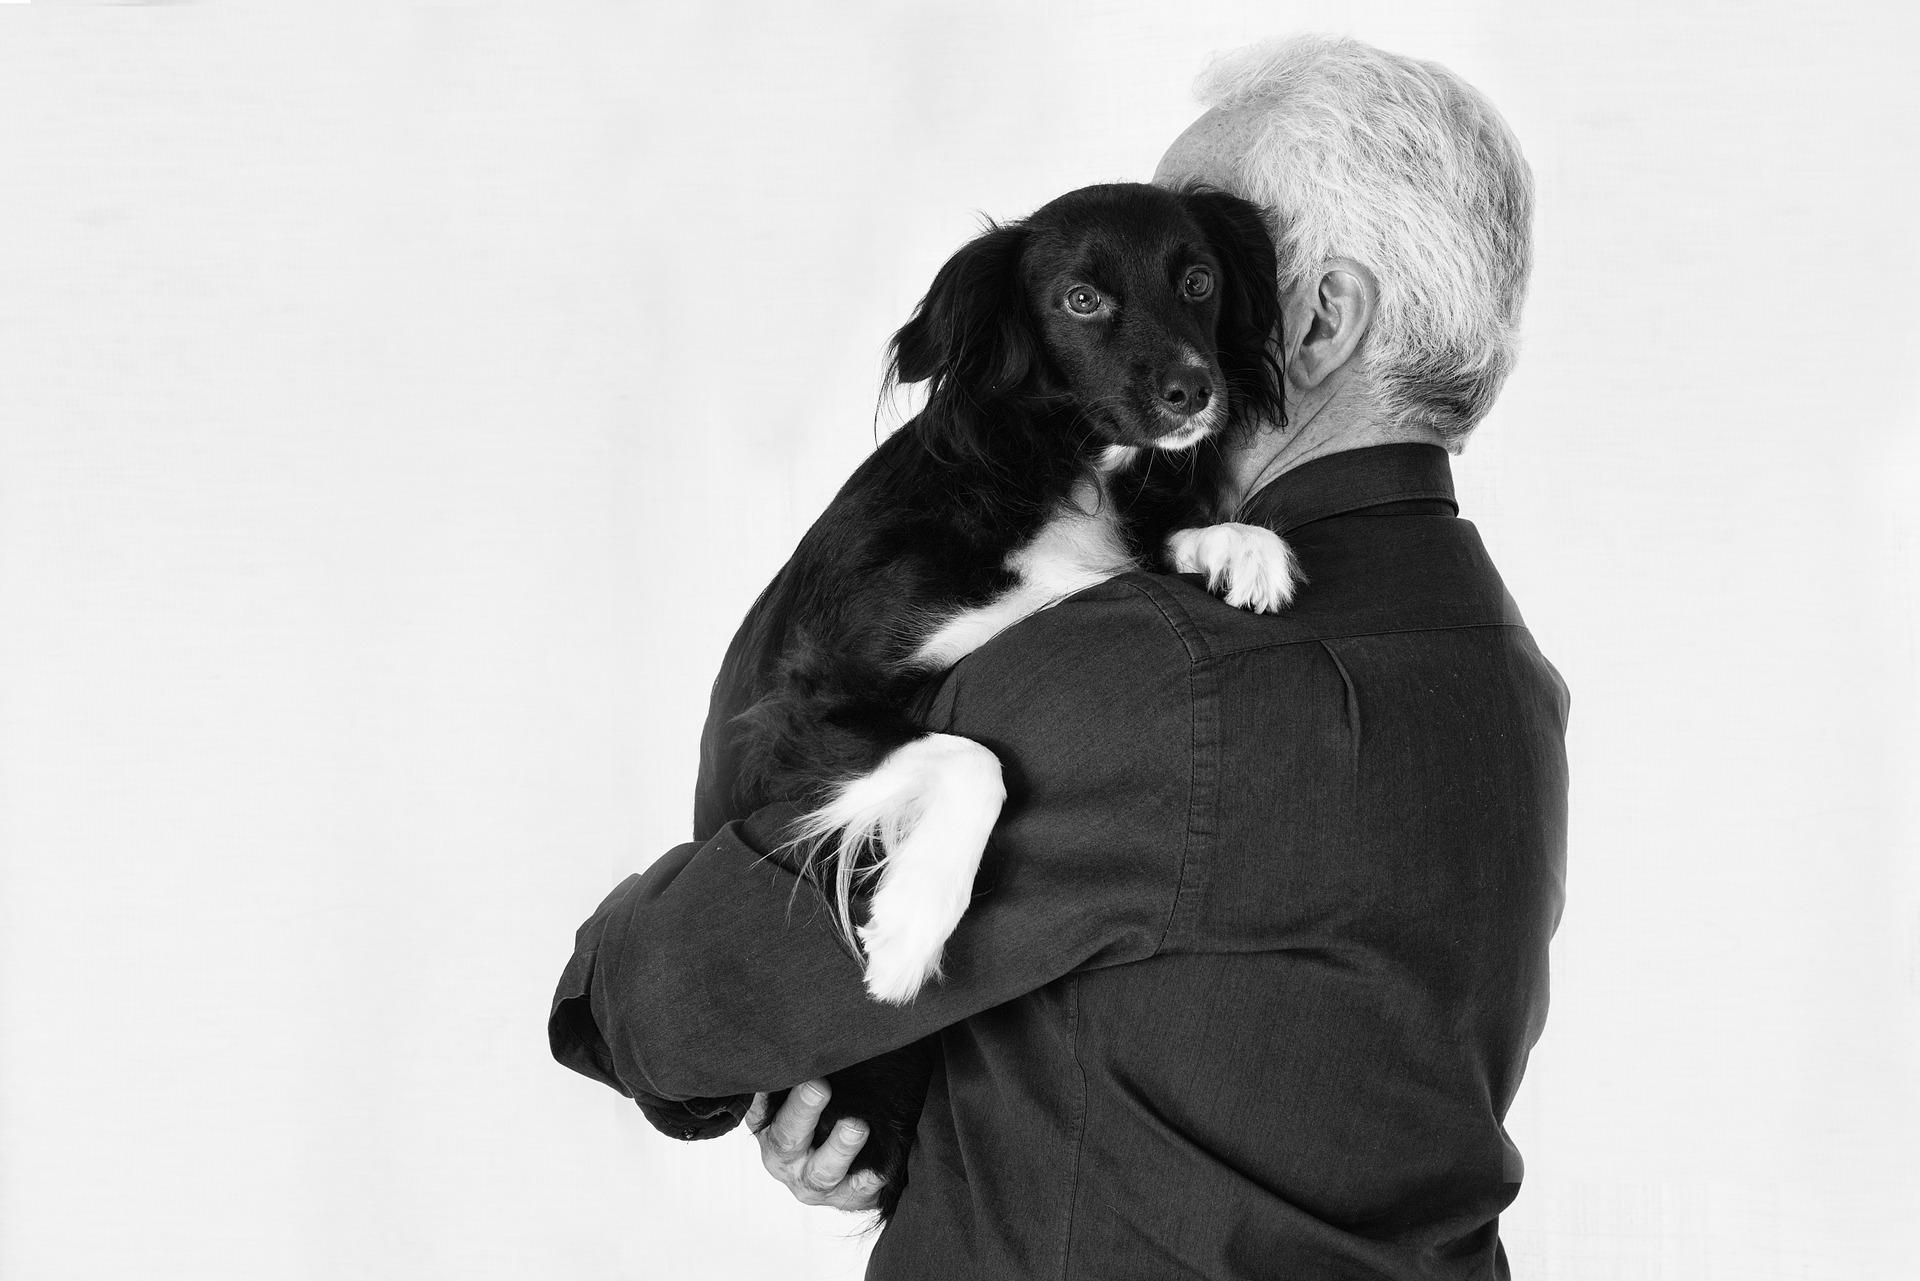 pet-Image by Jose Antonio Alba from Pixabay